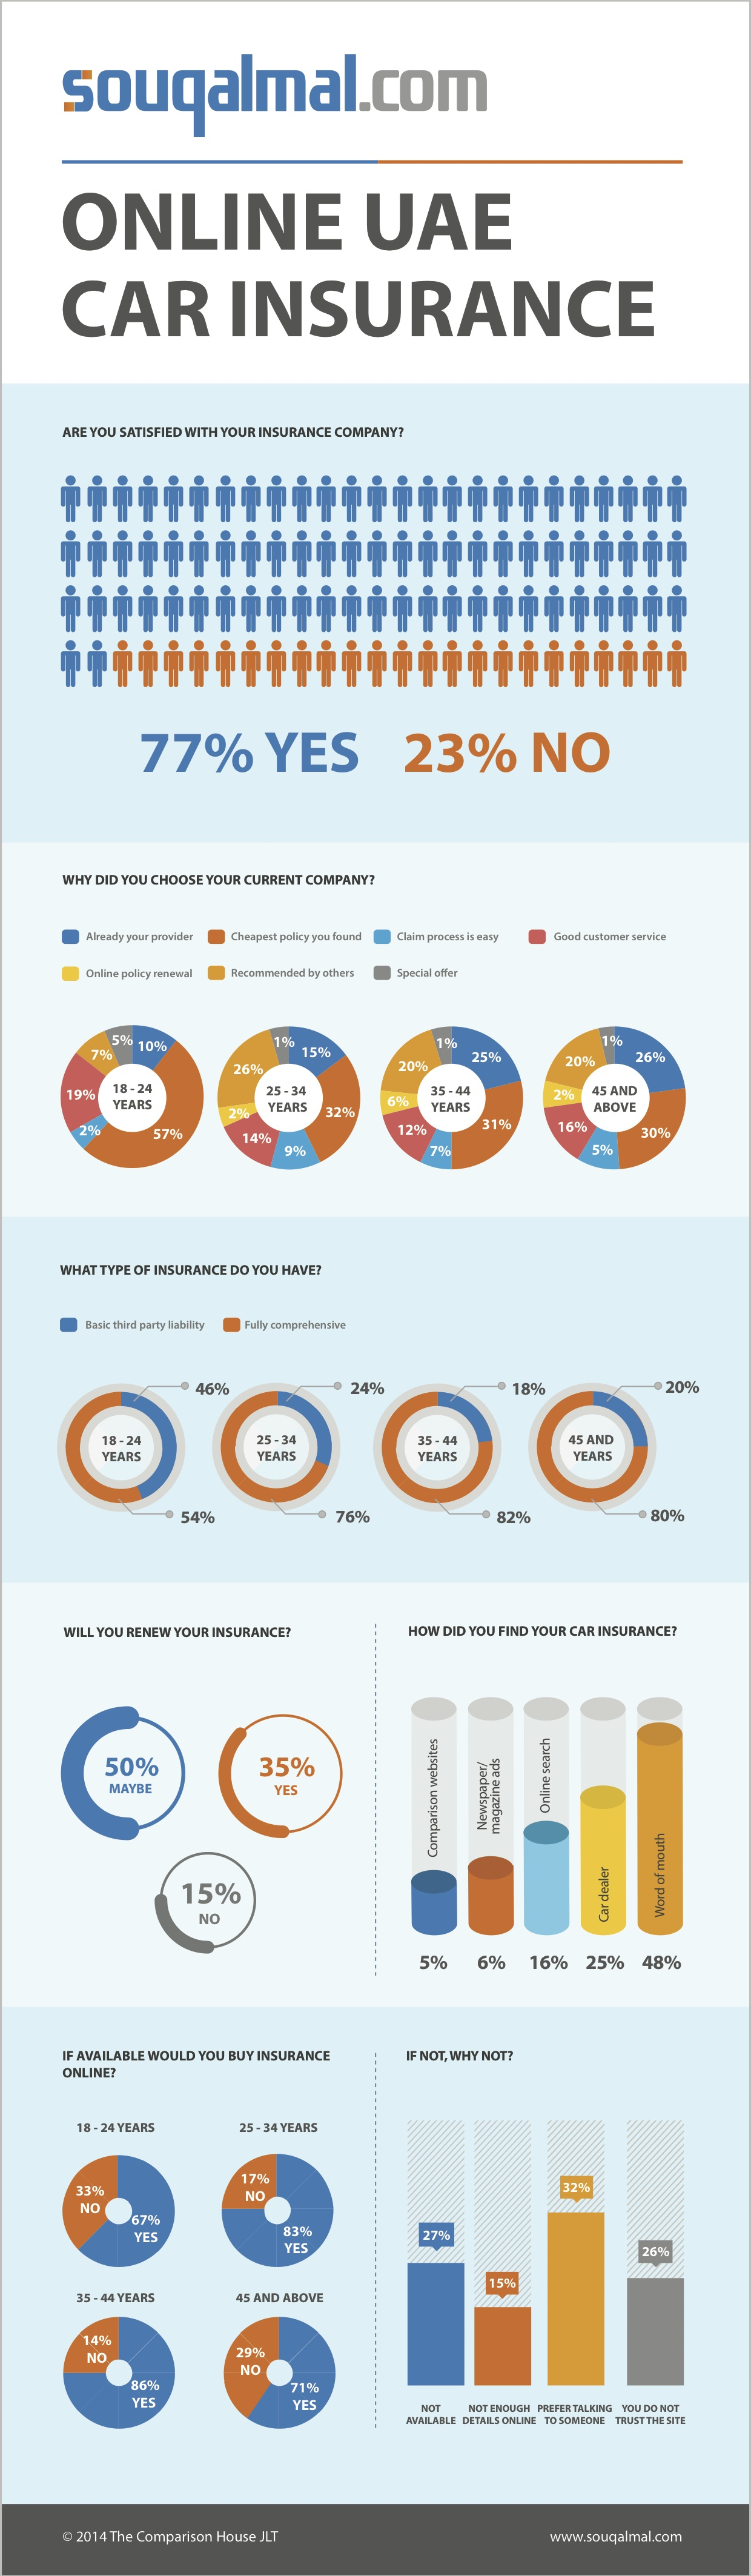 Infographic: Car insurance survey Jun-2014